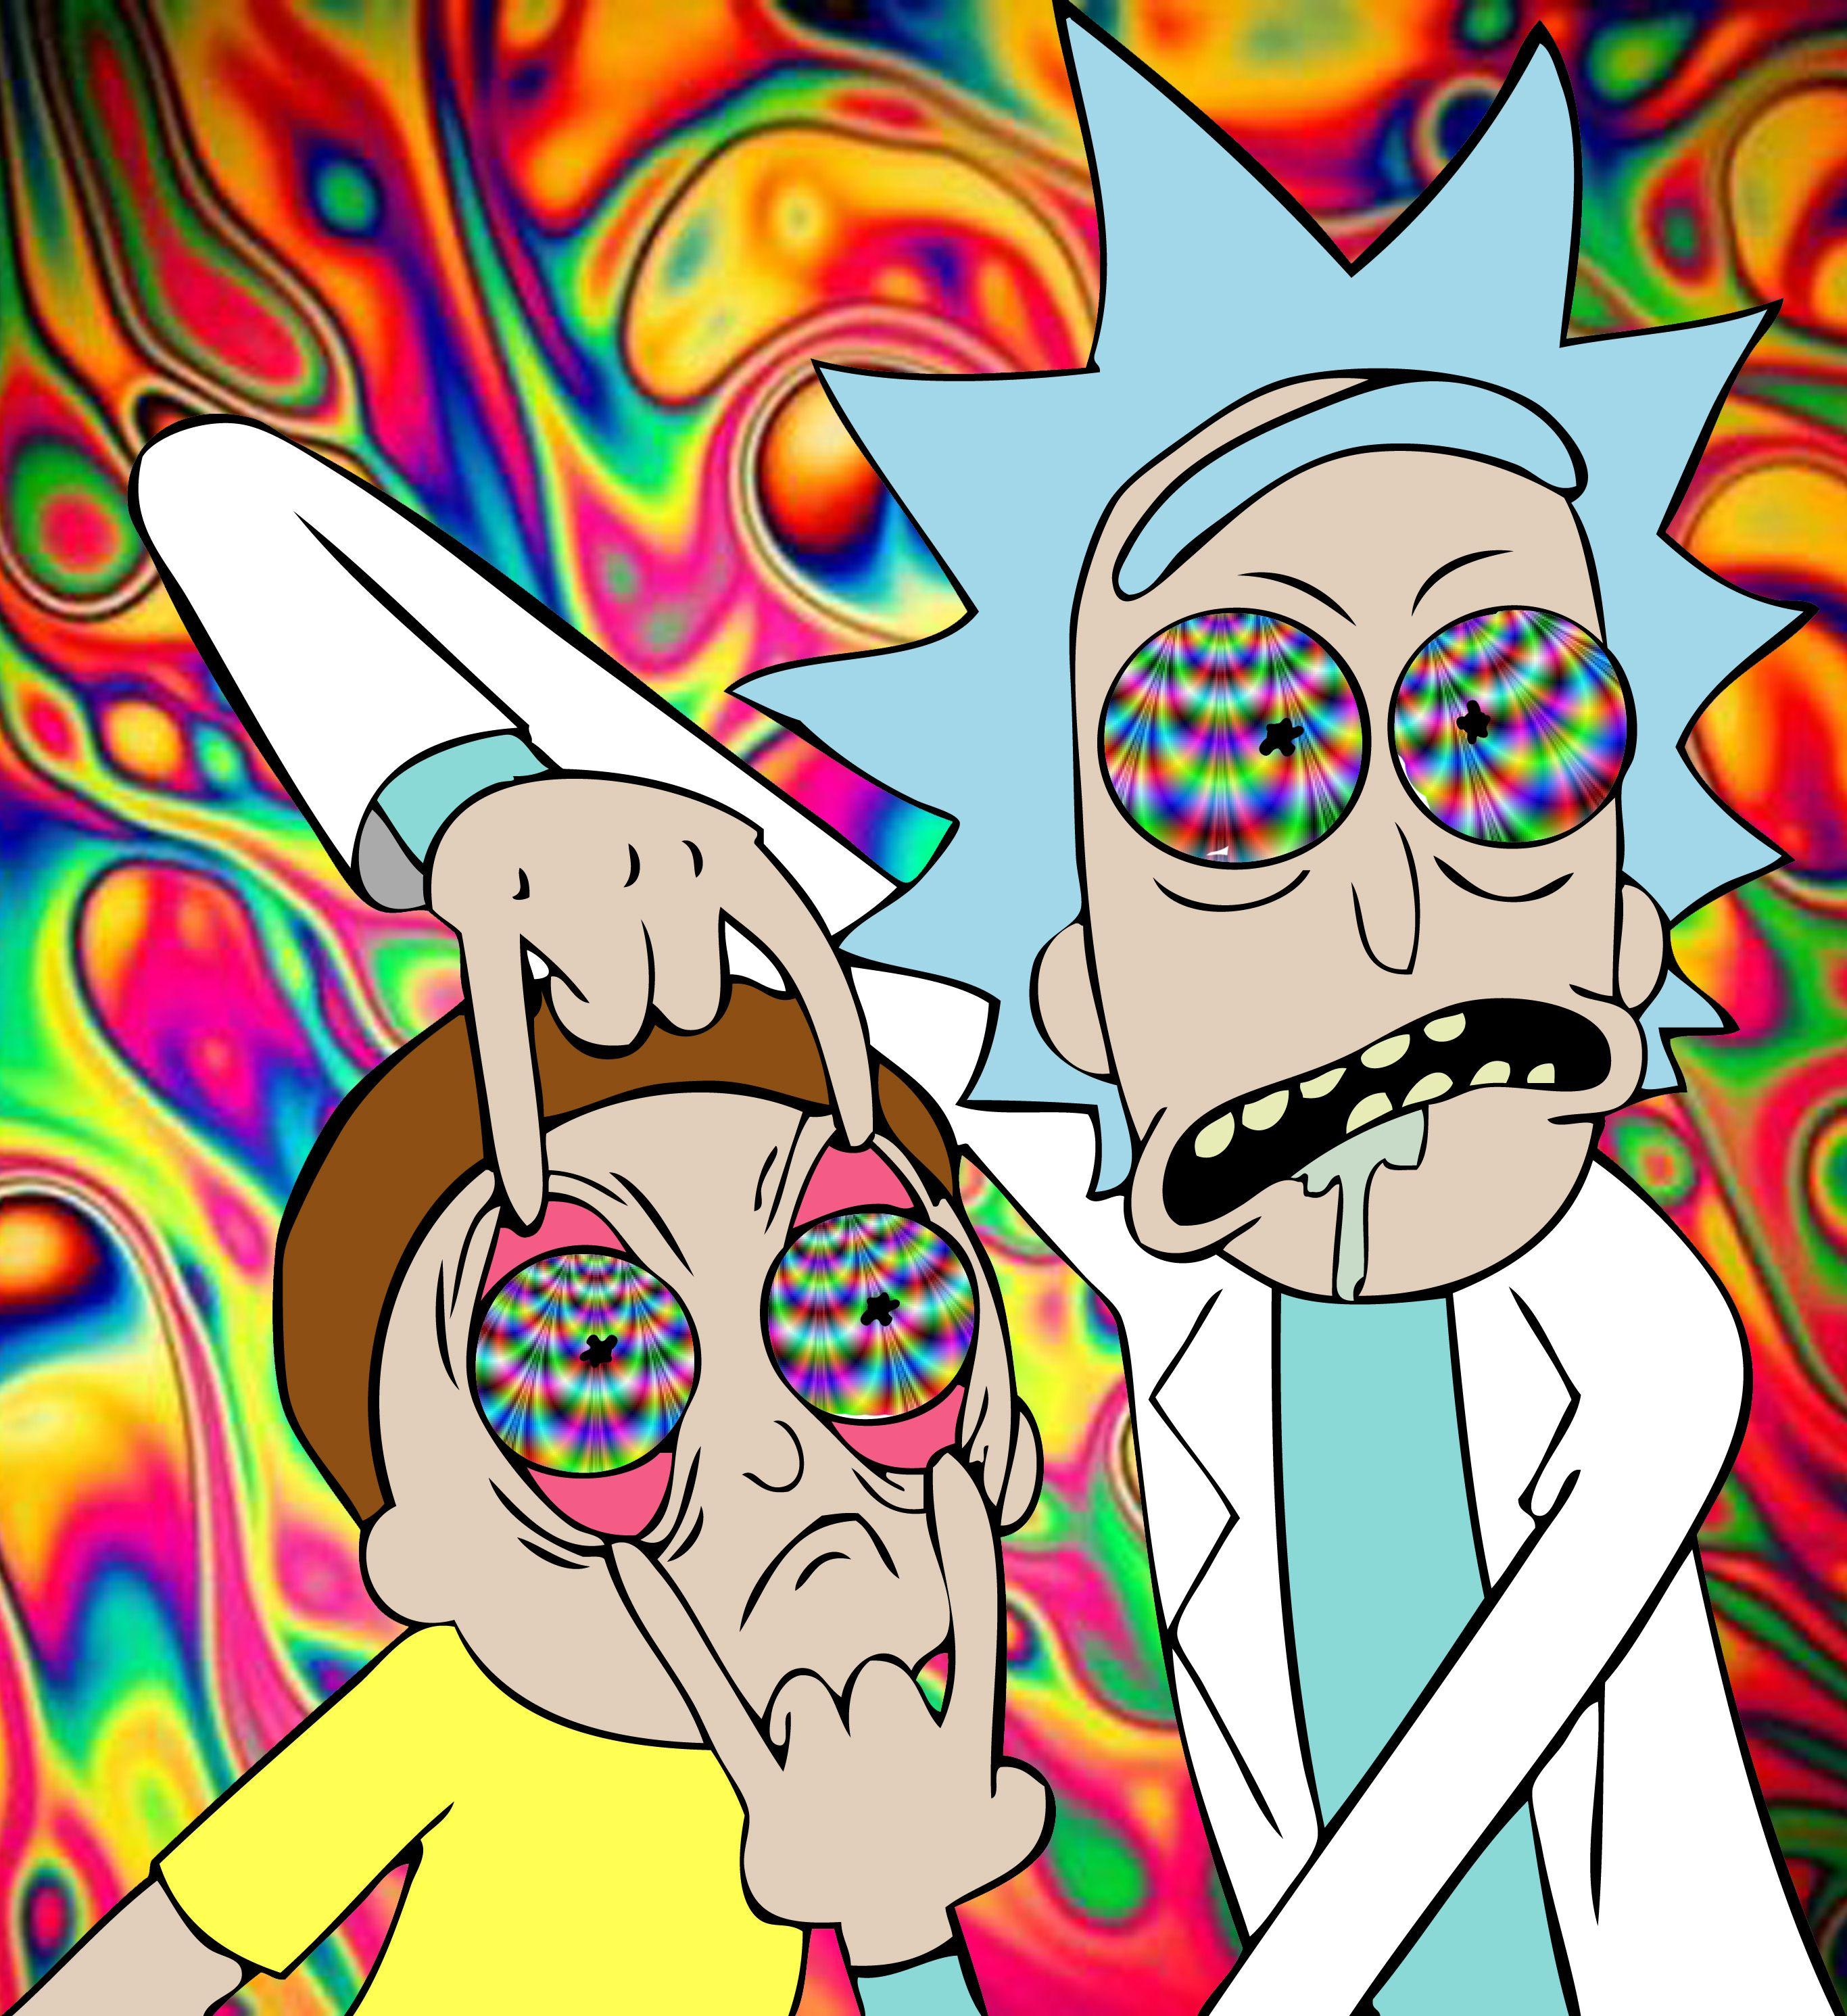 Cartoon Characters Getting High : Afbeeldingsresultaat voor rick and morty design sth